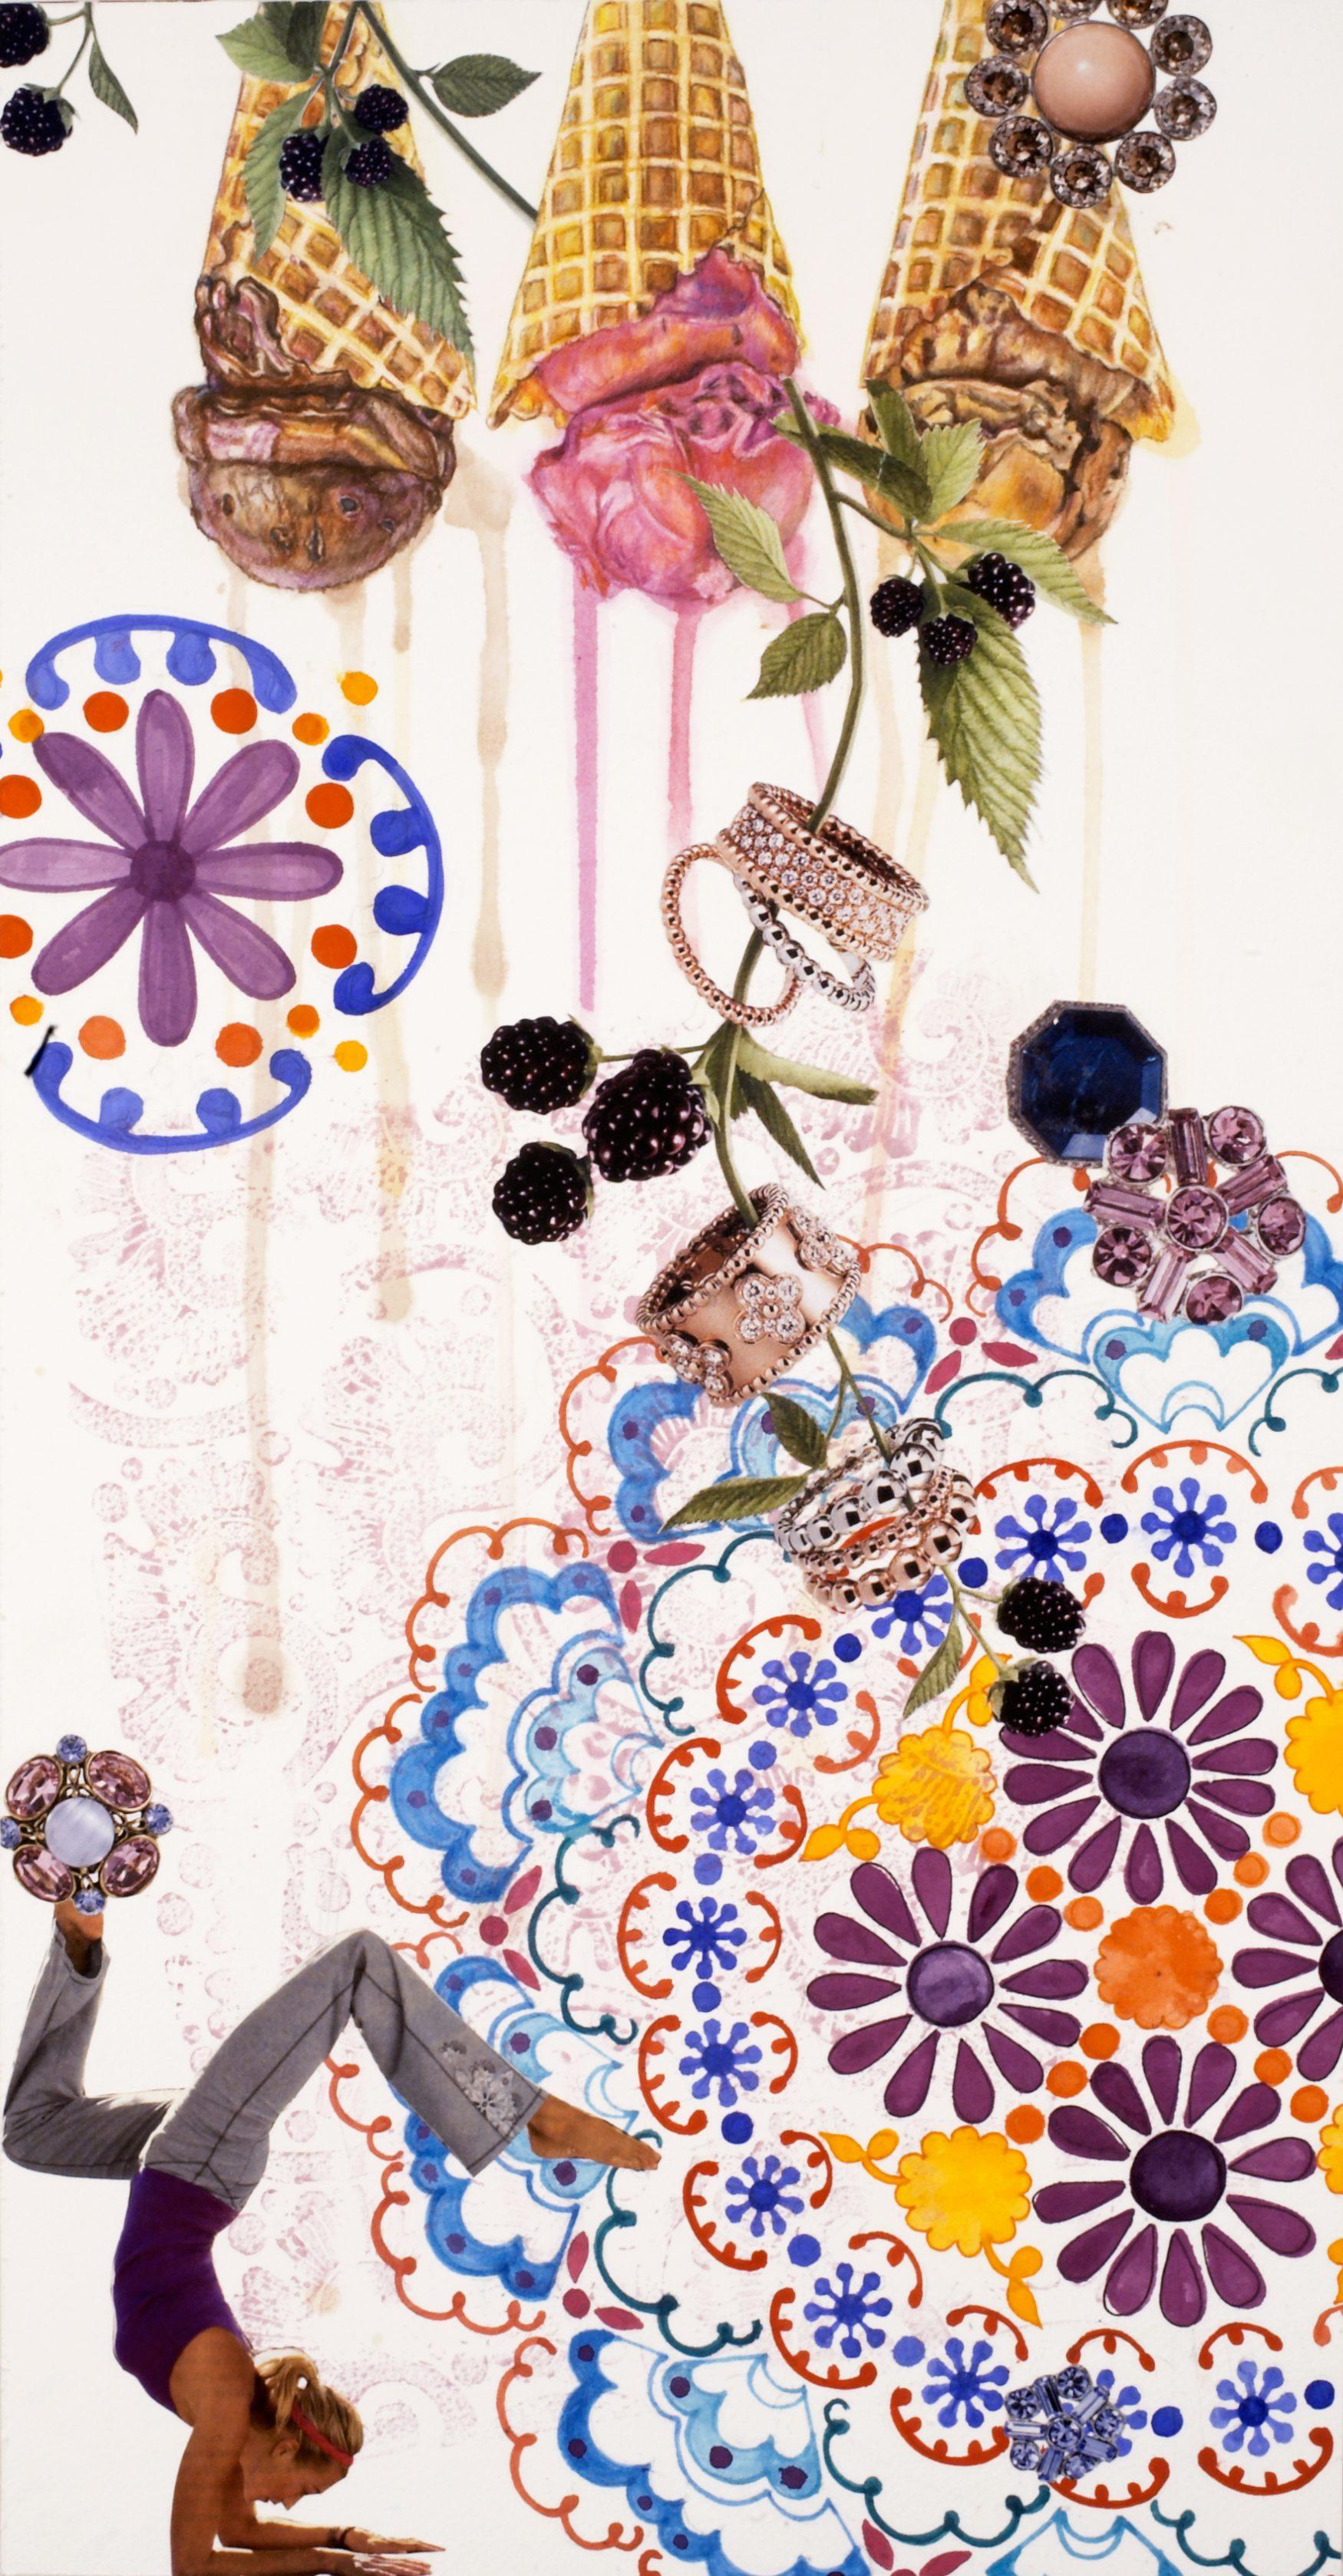 Kira Nam Greene Dripping Jewels